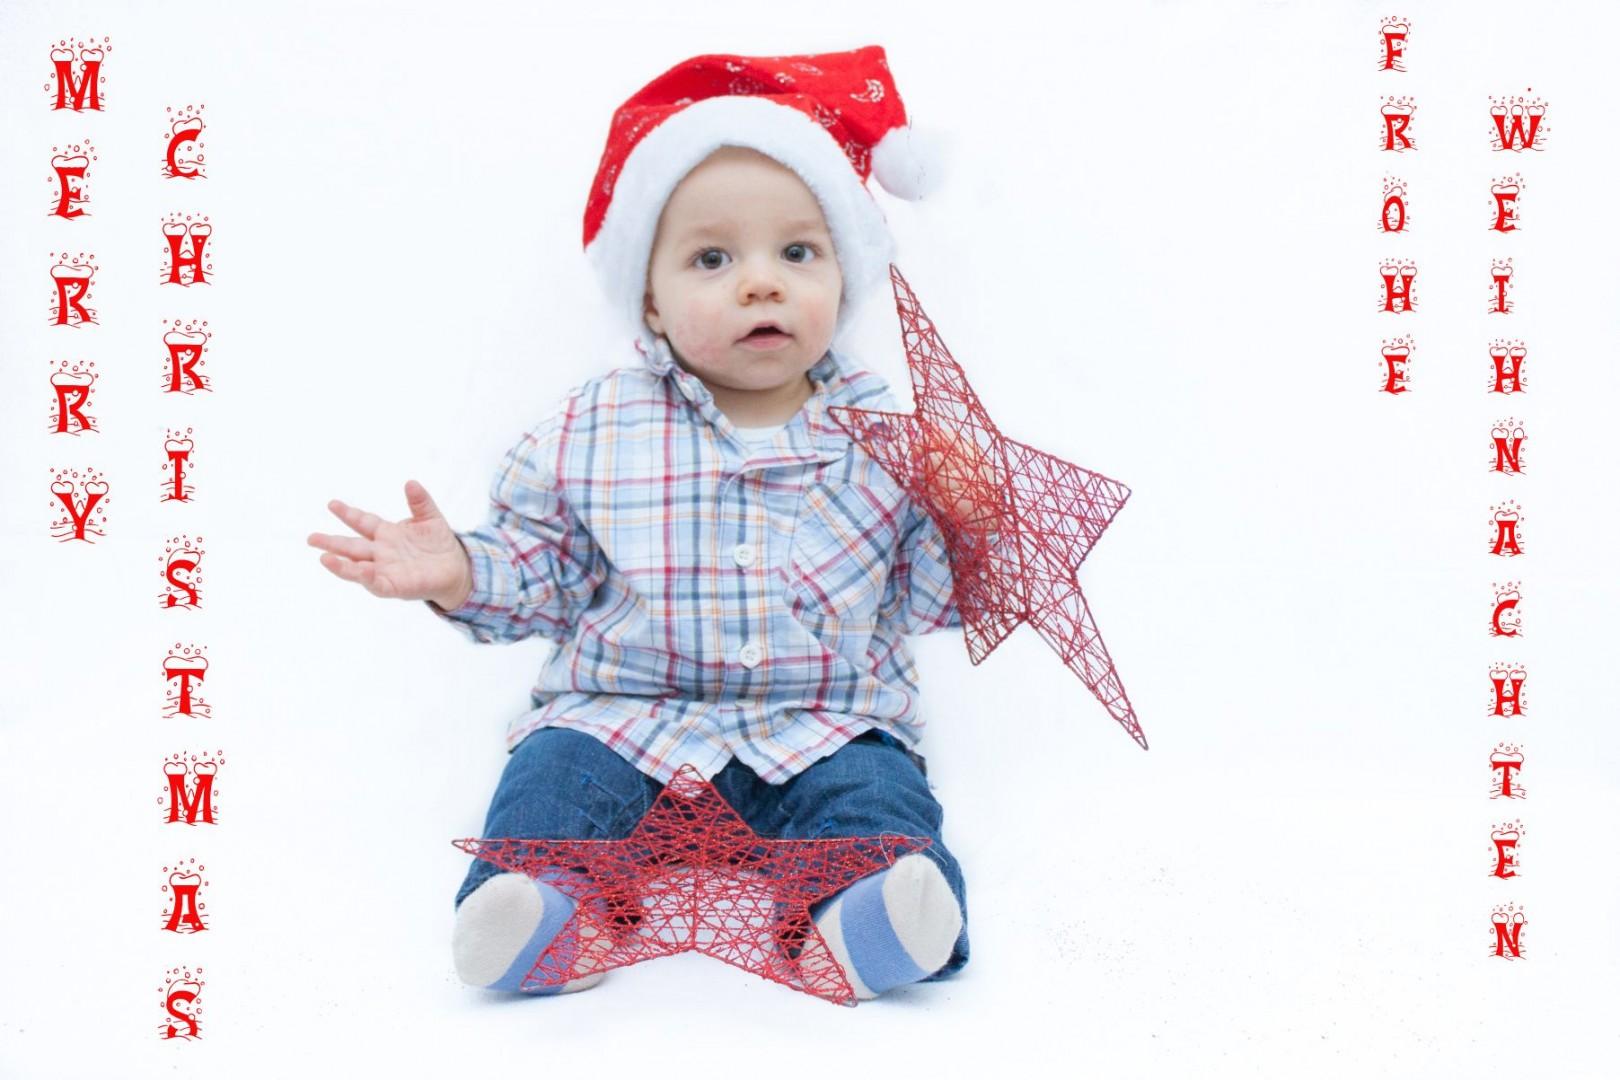 Yannik wünscht frohe Weihnachten